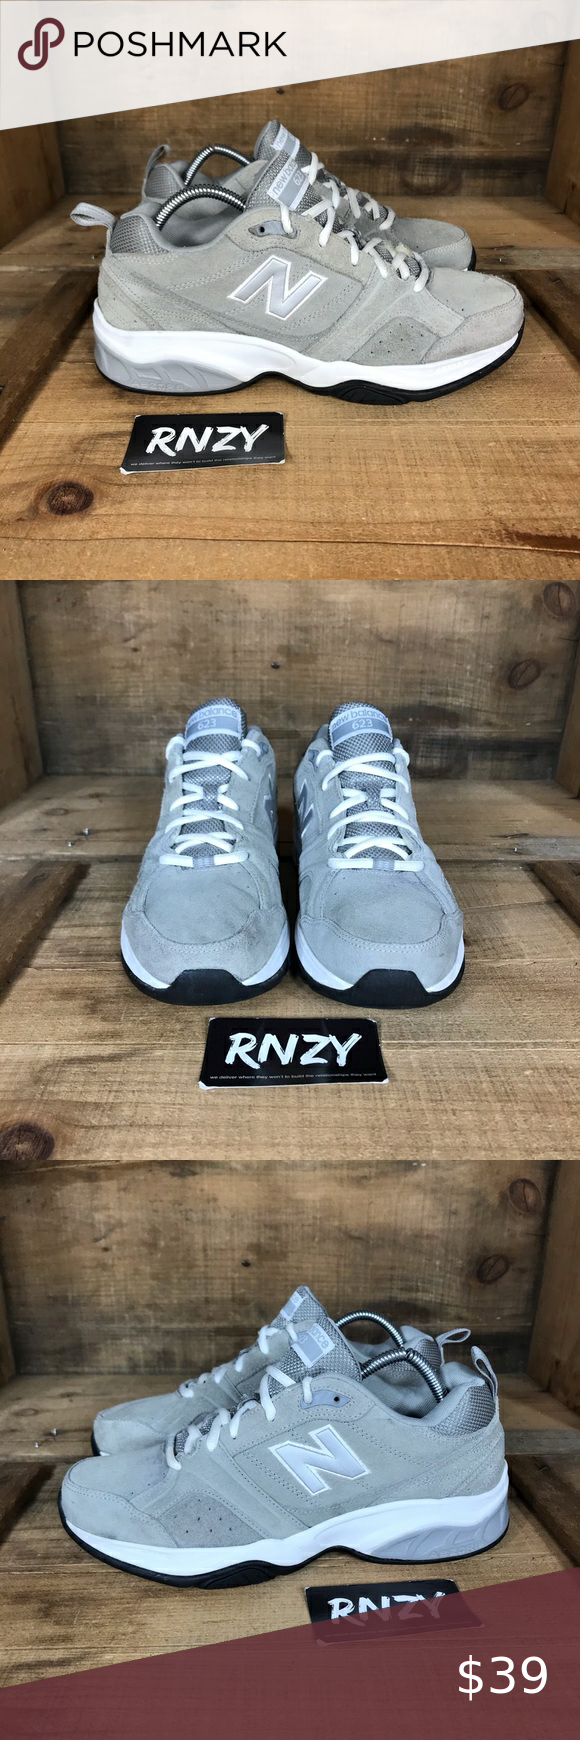 new balance 623 grey suede